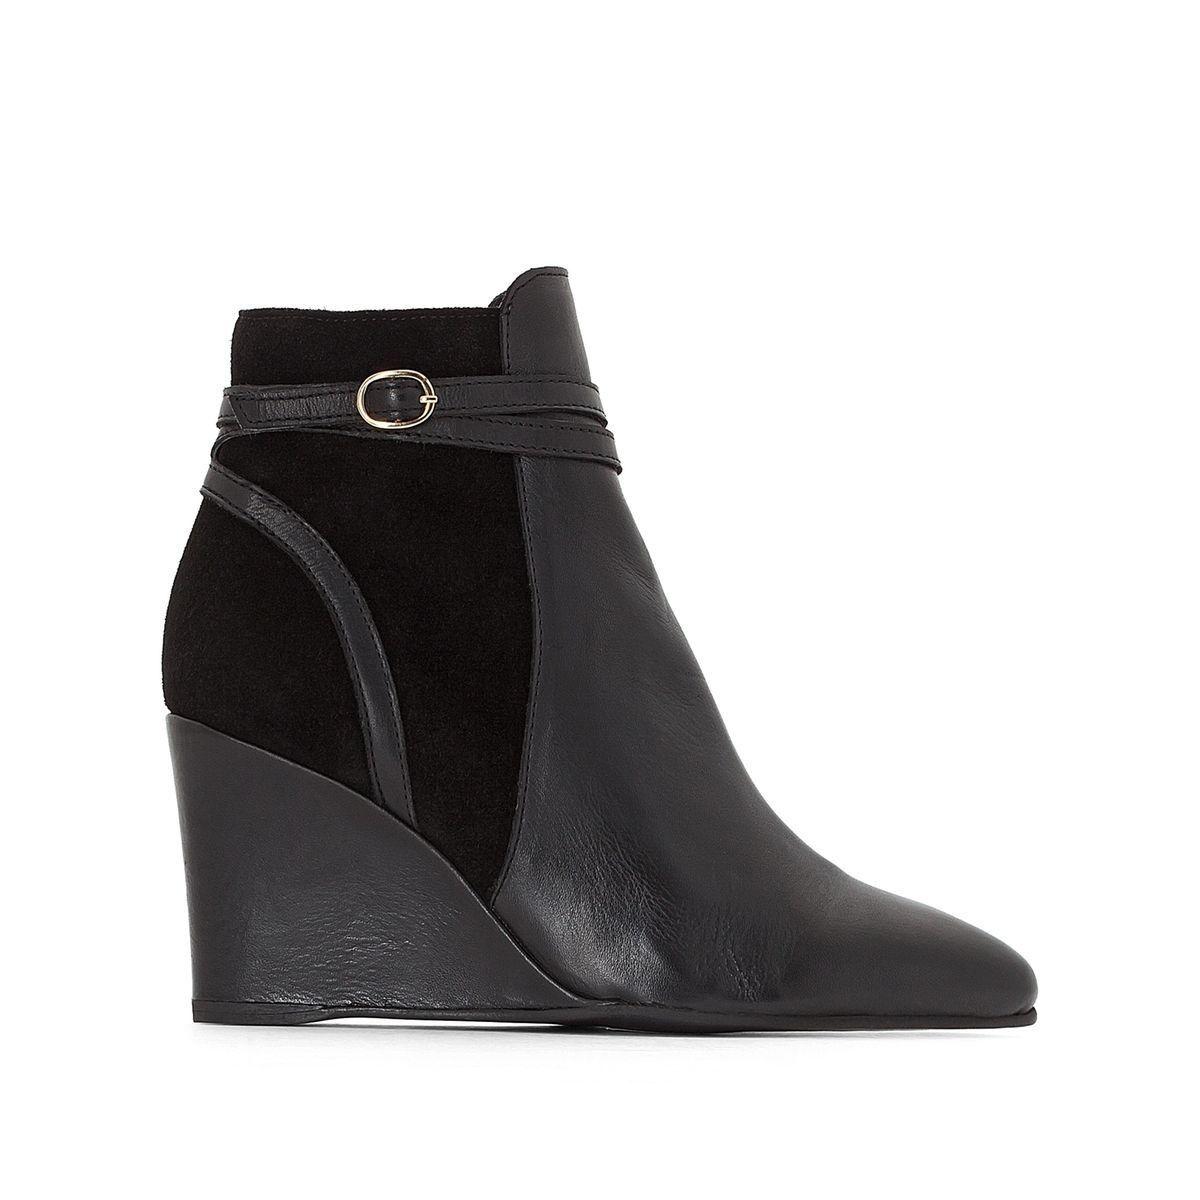 La redoute boots